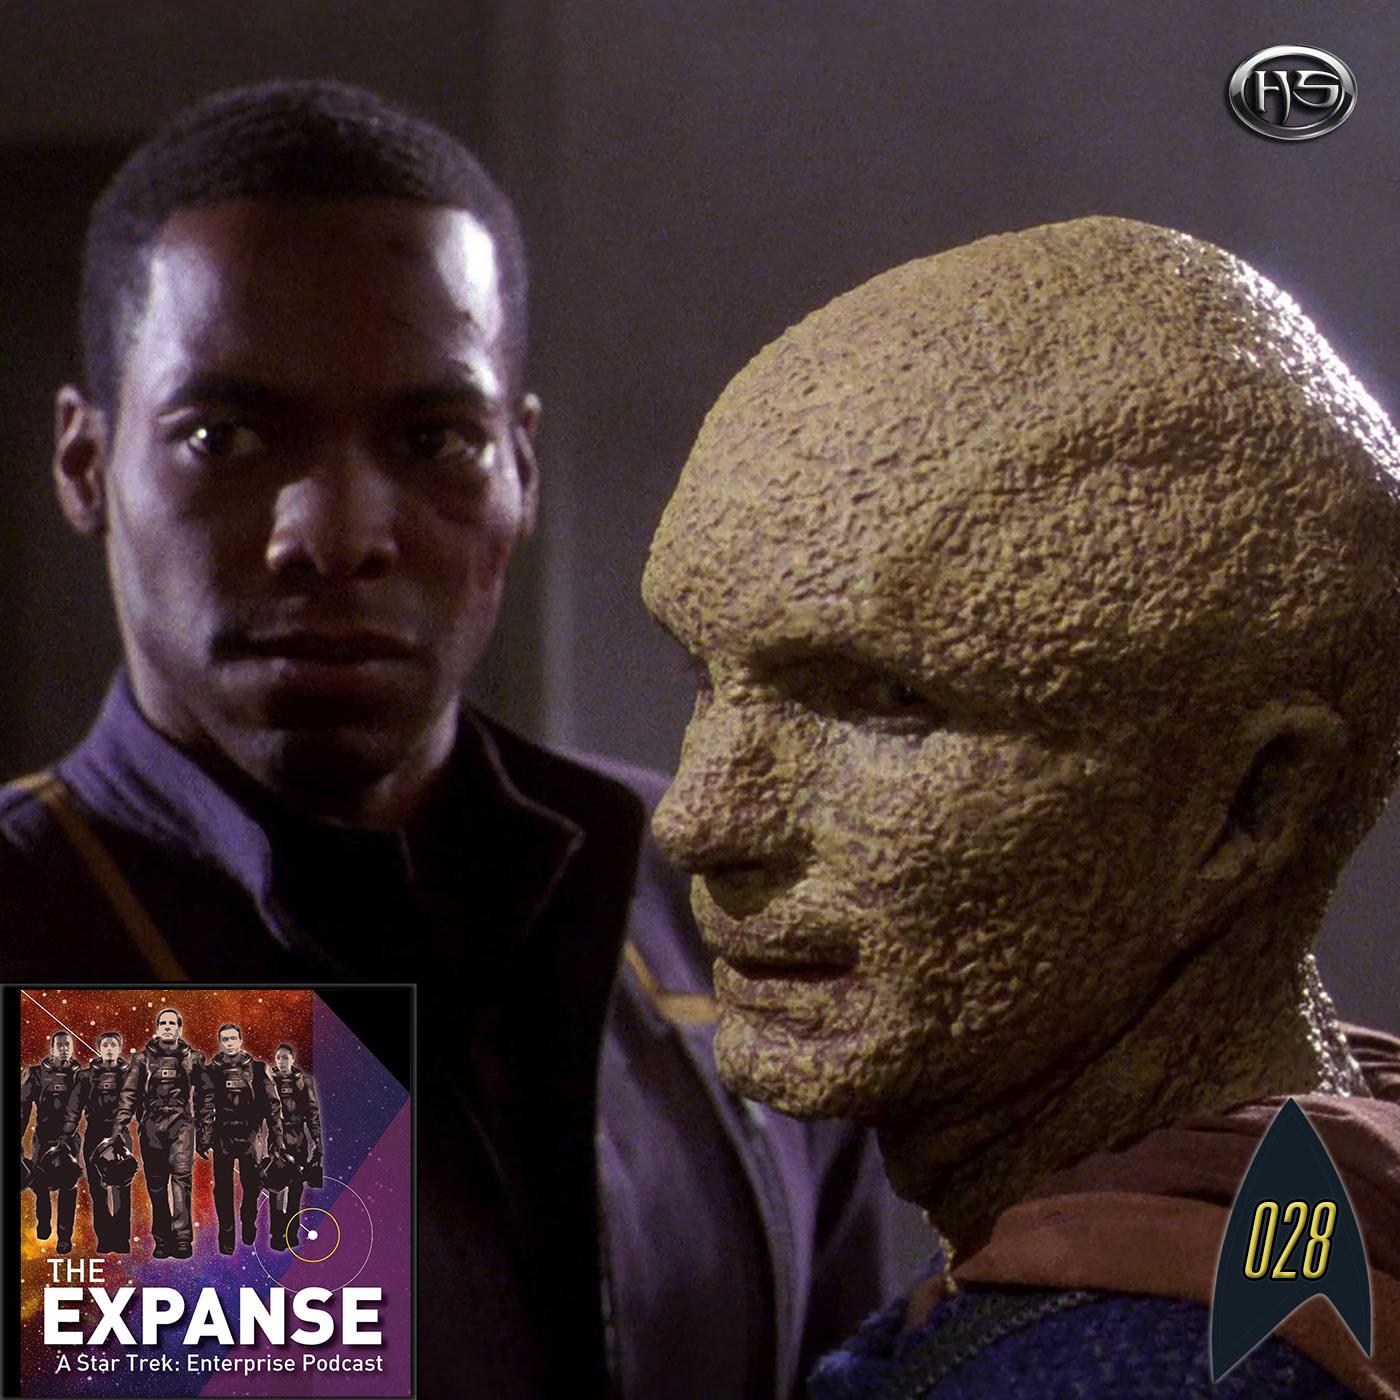 The Expanse Episode 28